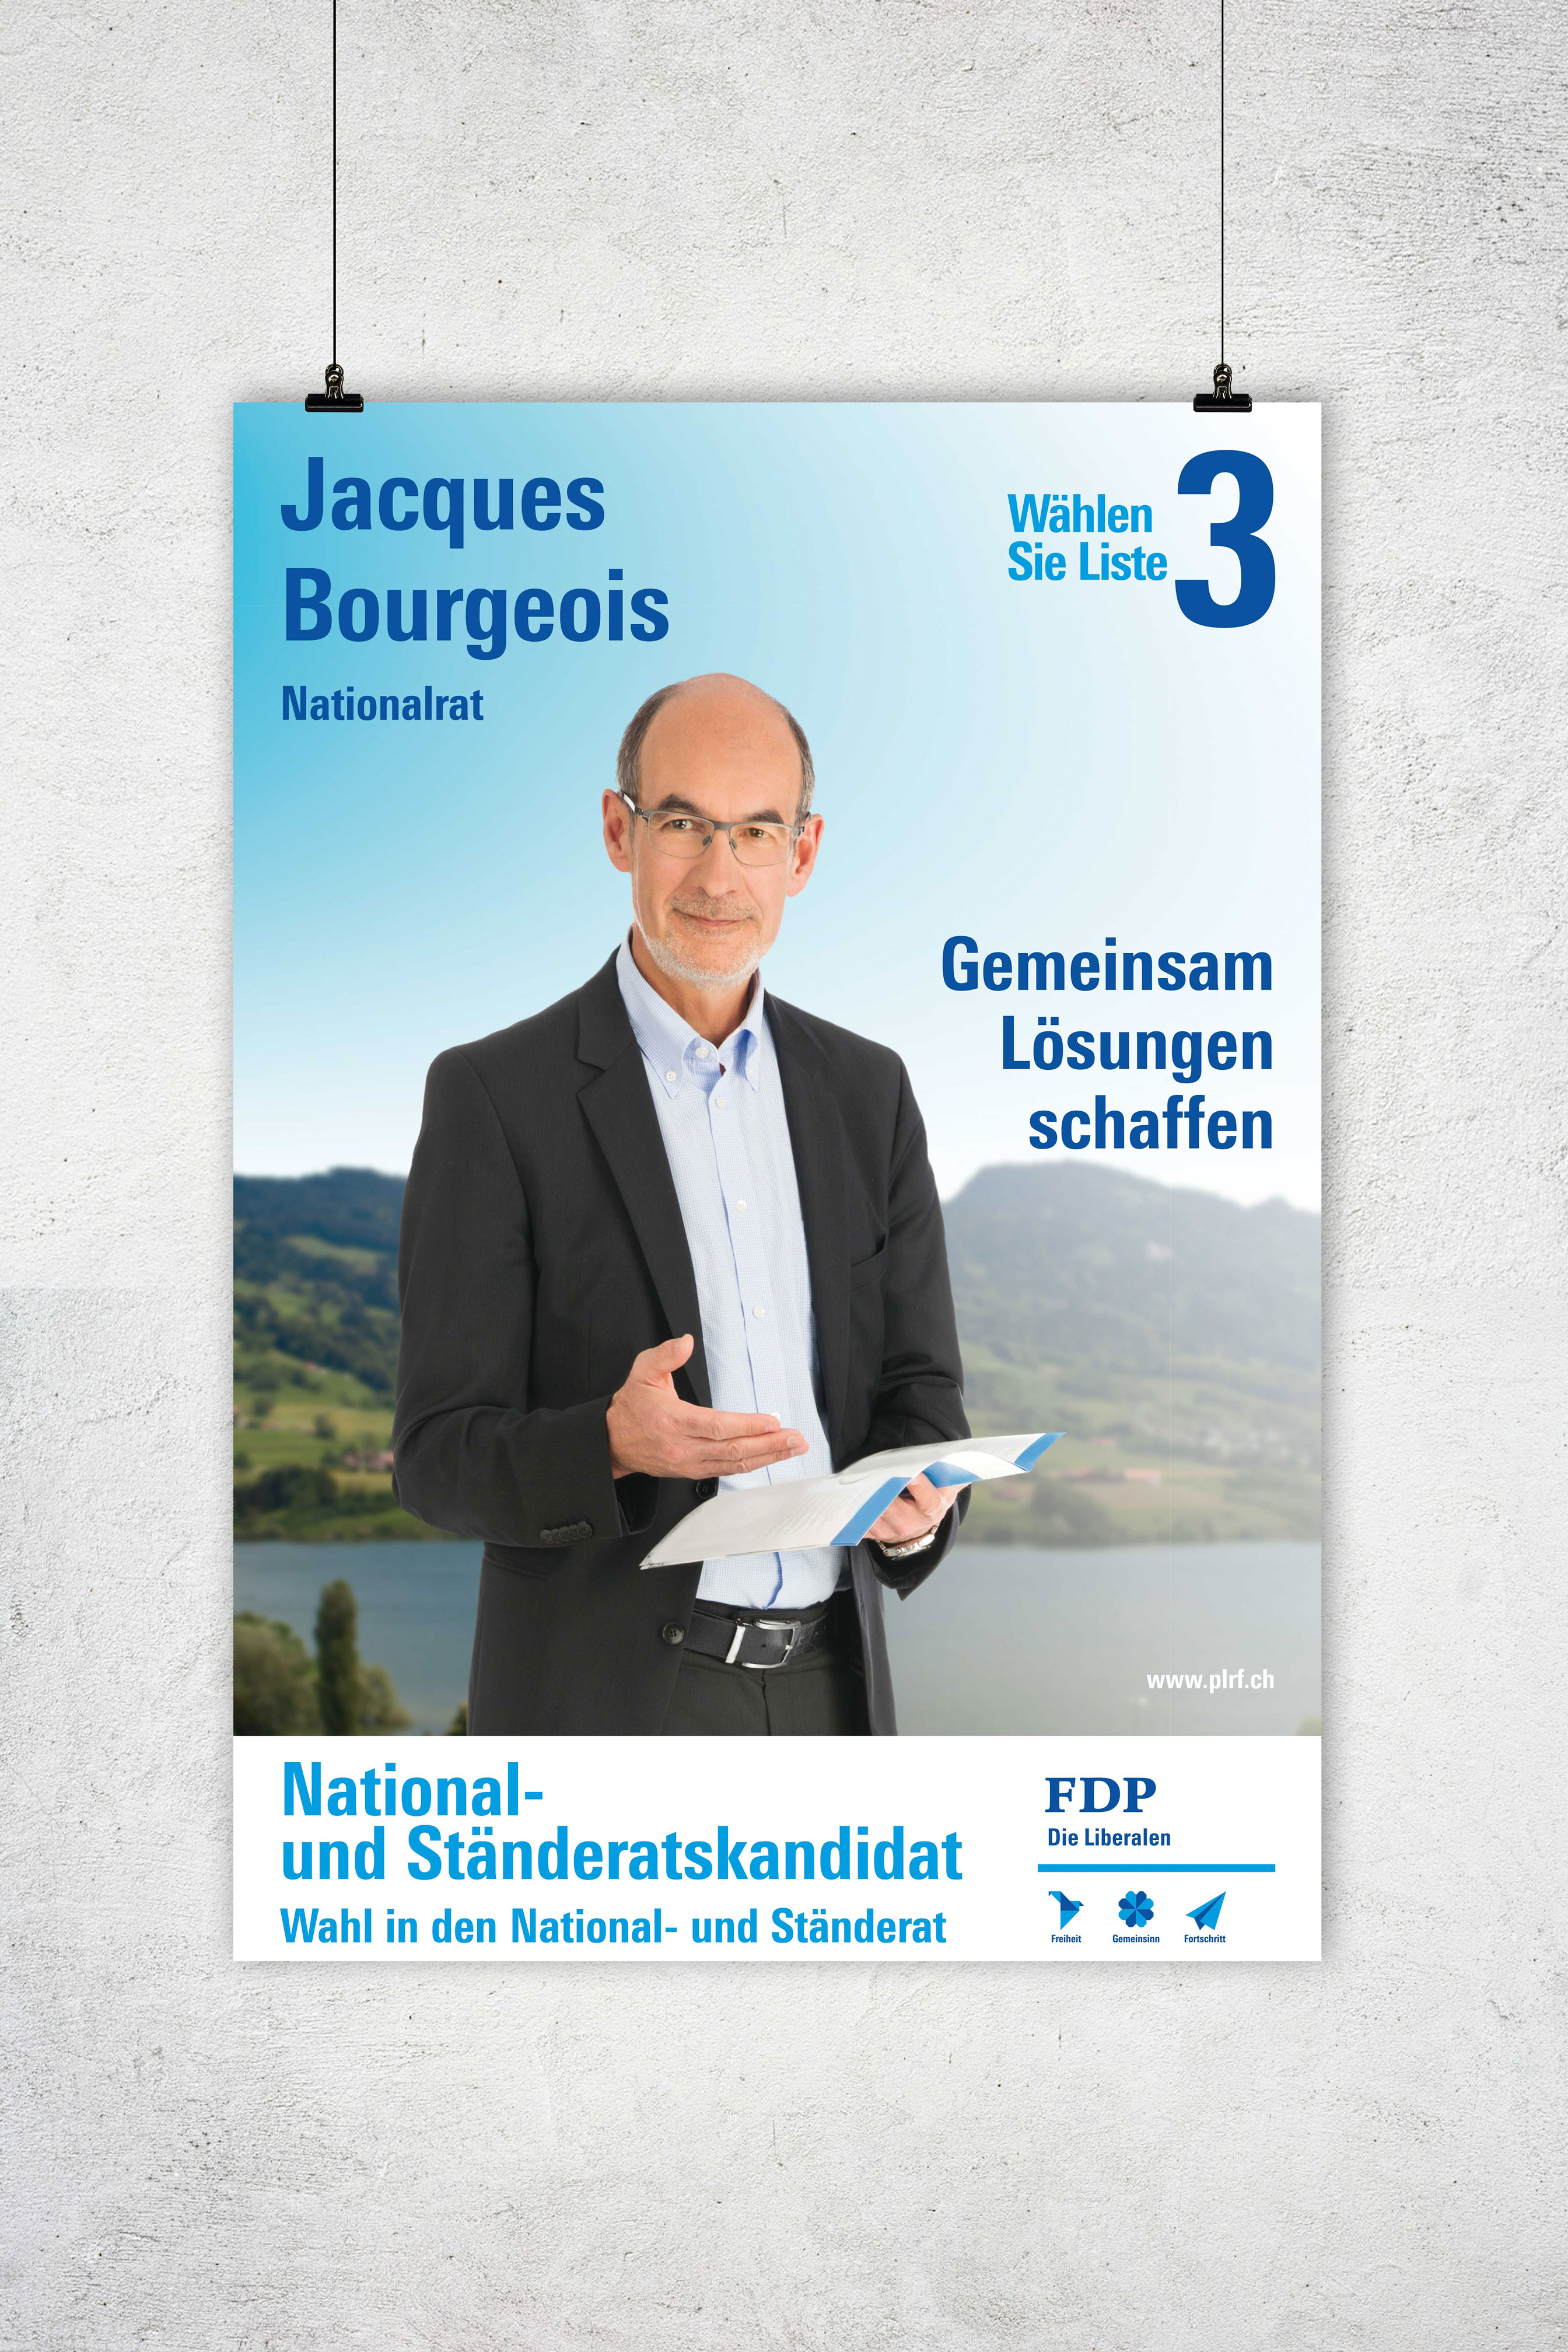 Mockup_grey_candidat1